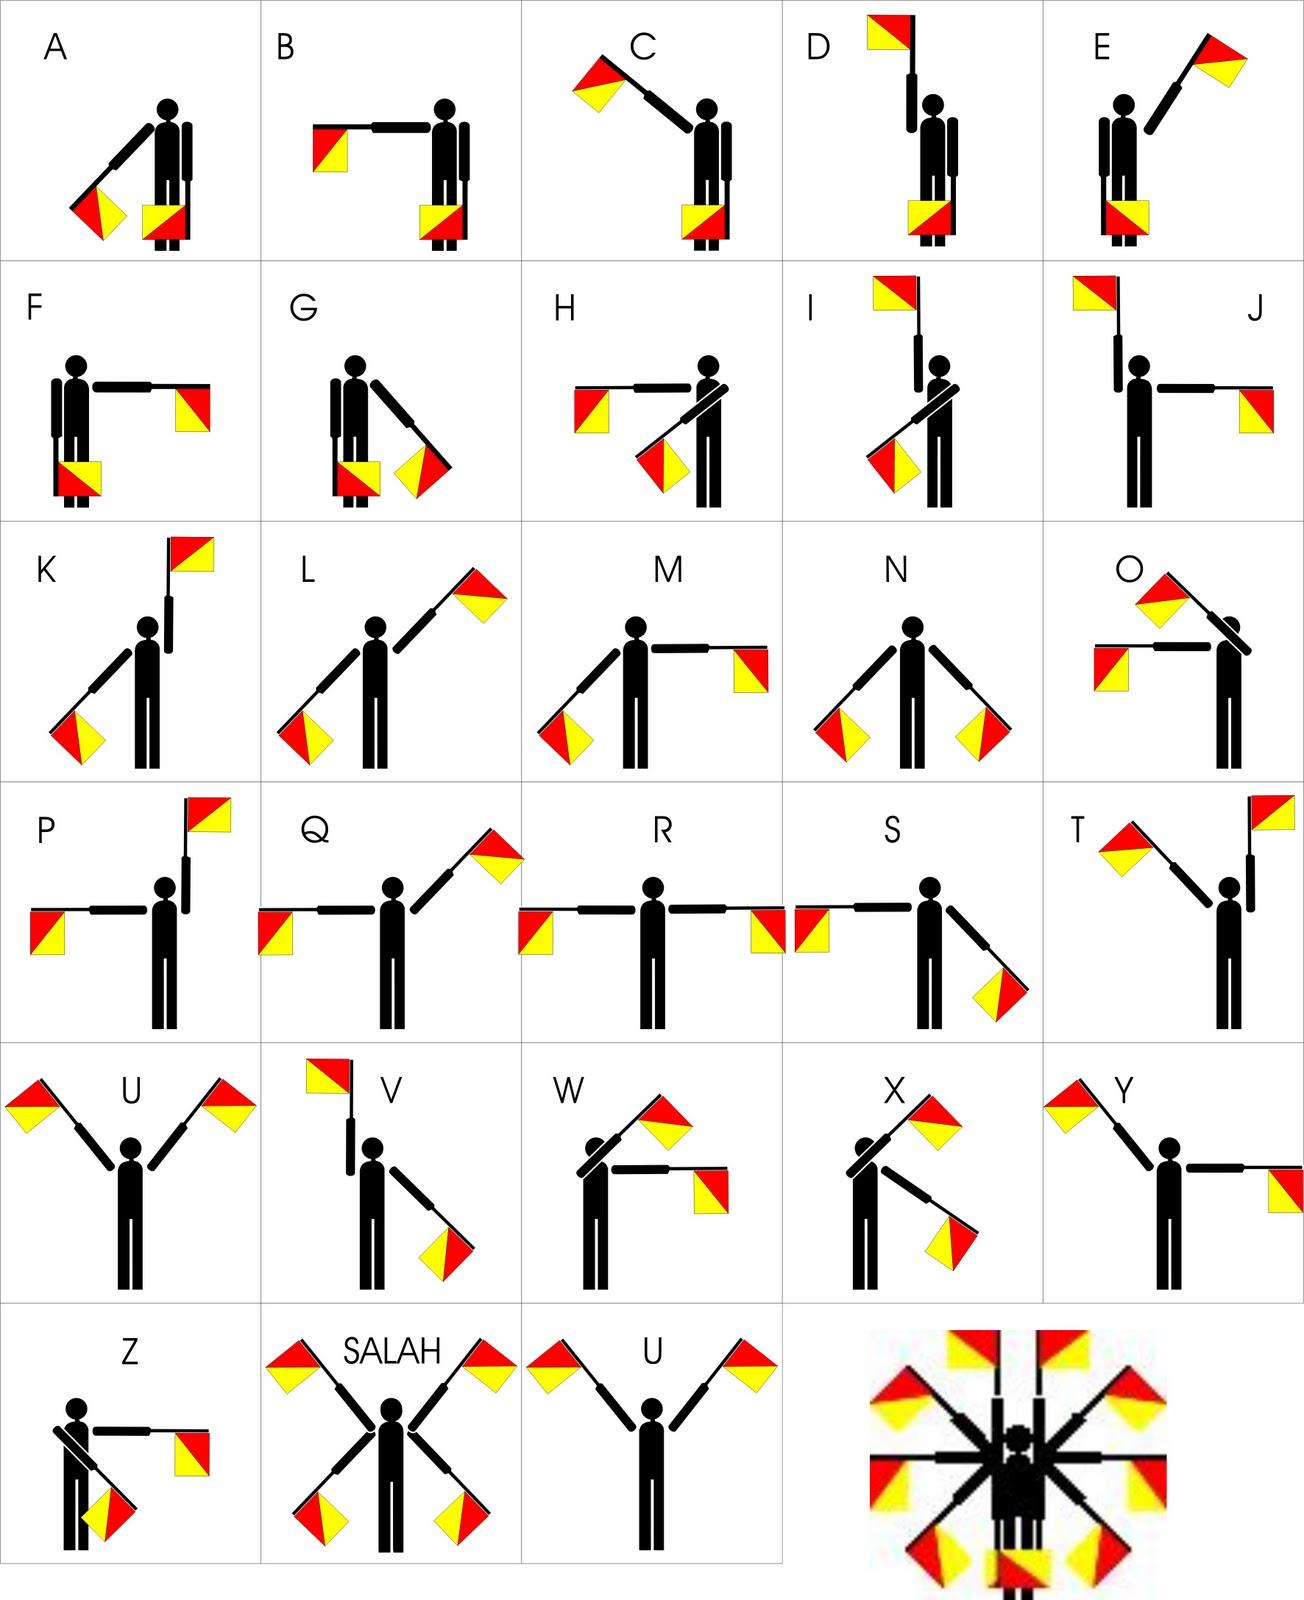 how to make semaphore flags